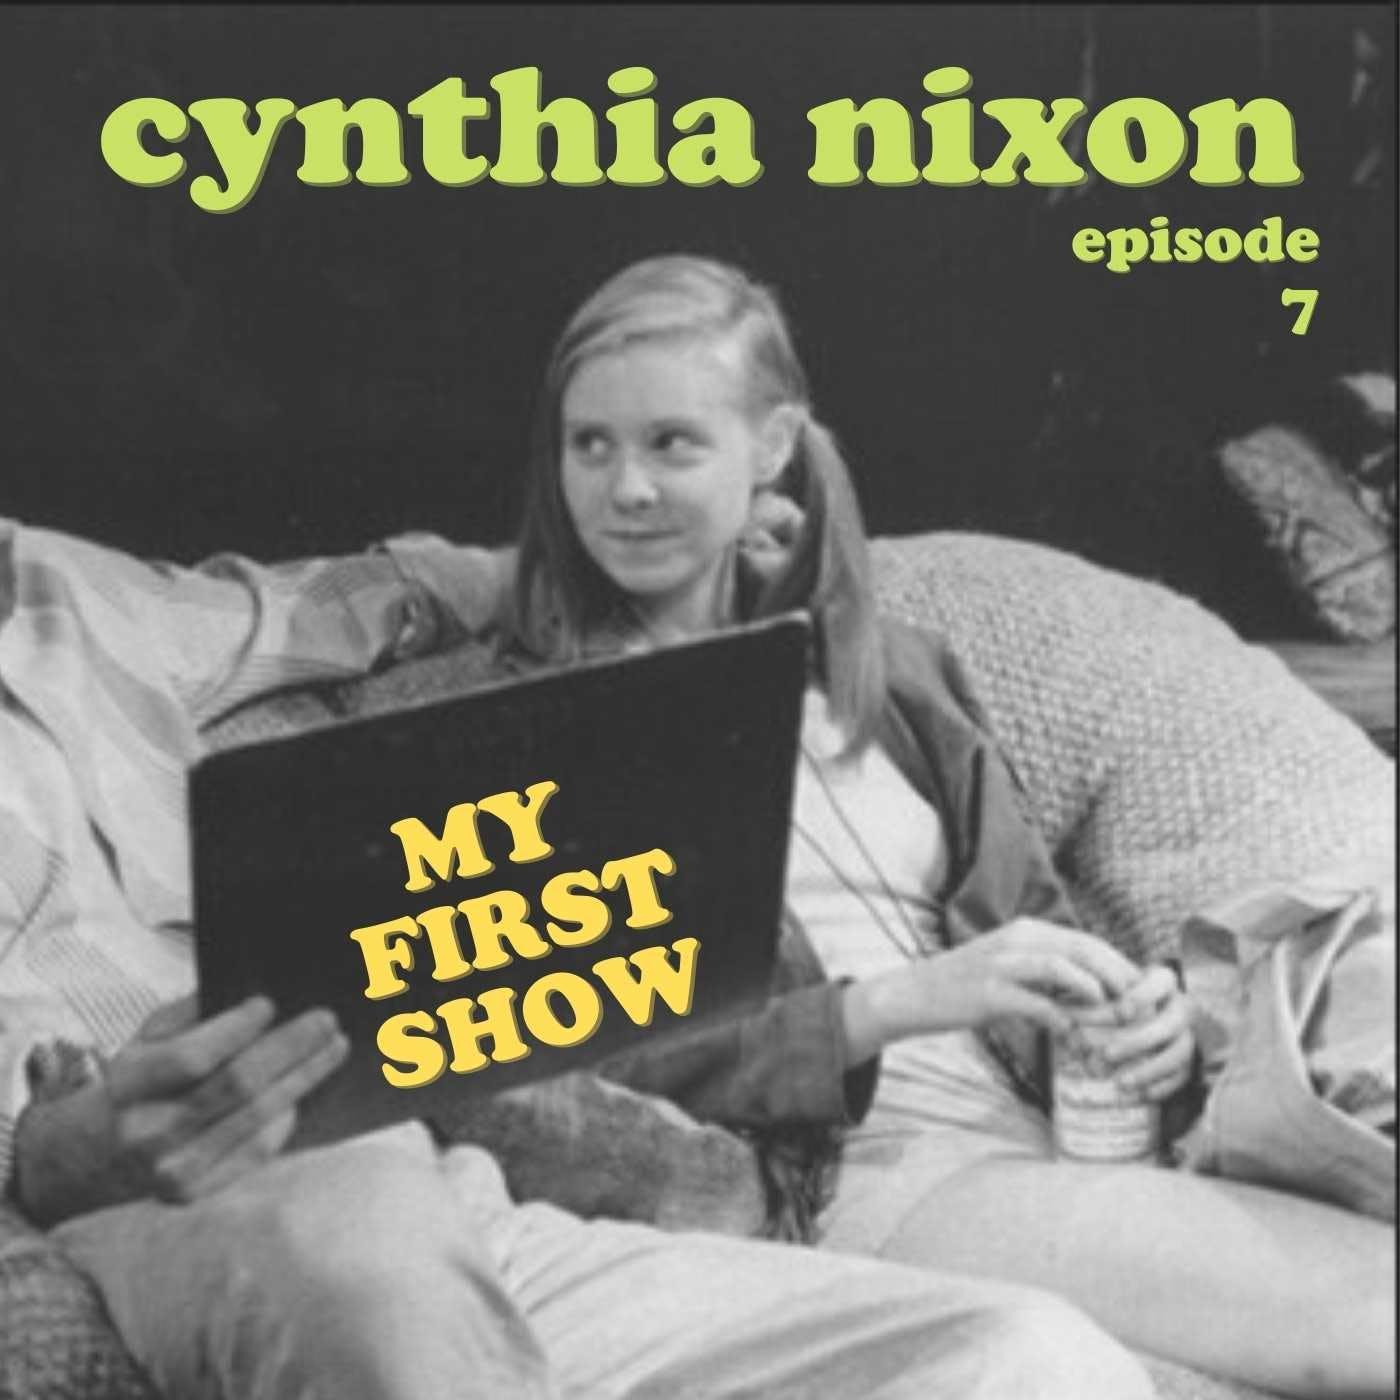 S1/Ep7: Cynthia Nixon